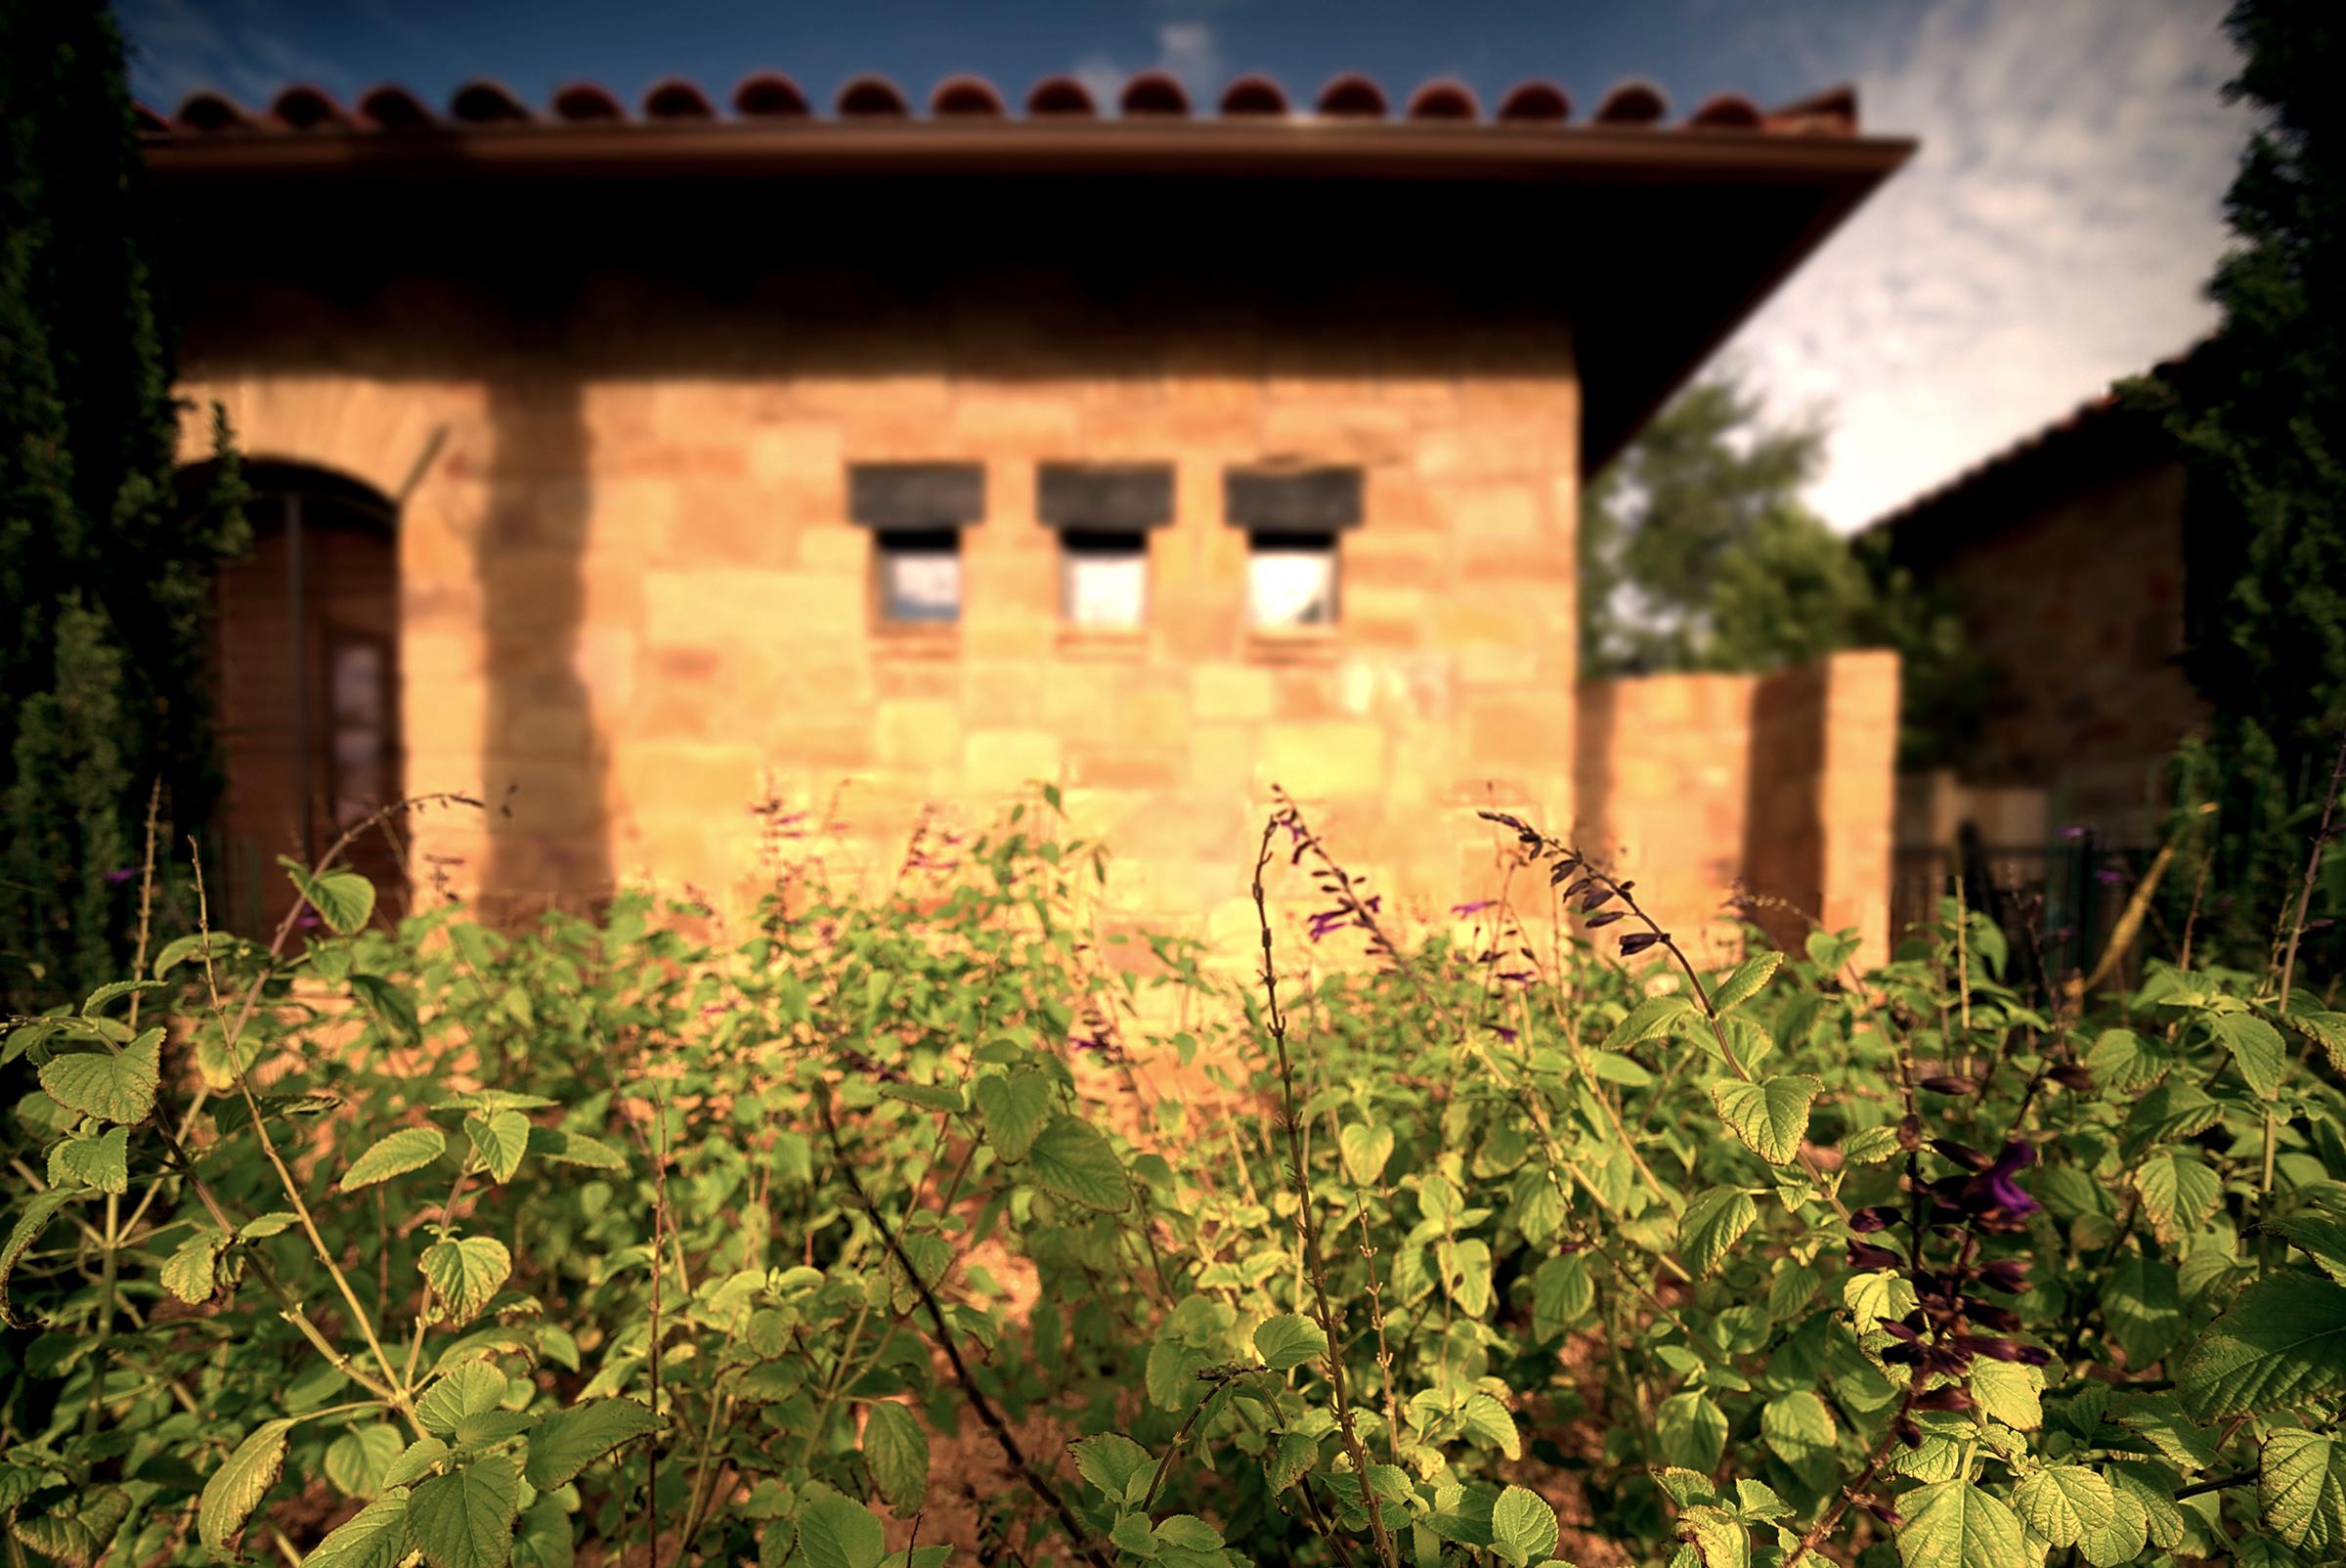 4-07-LS Courtyard.jpg